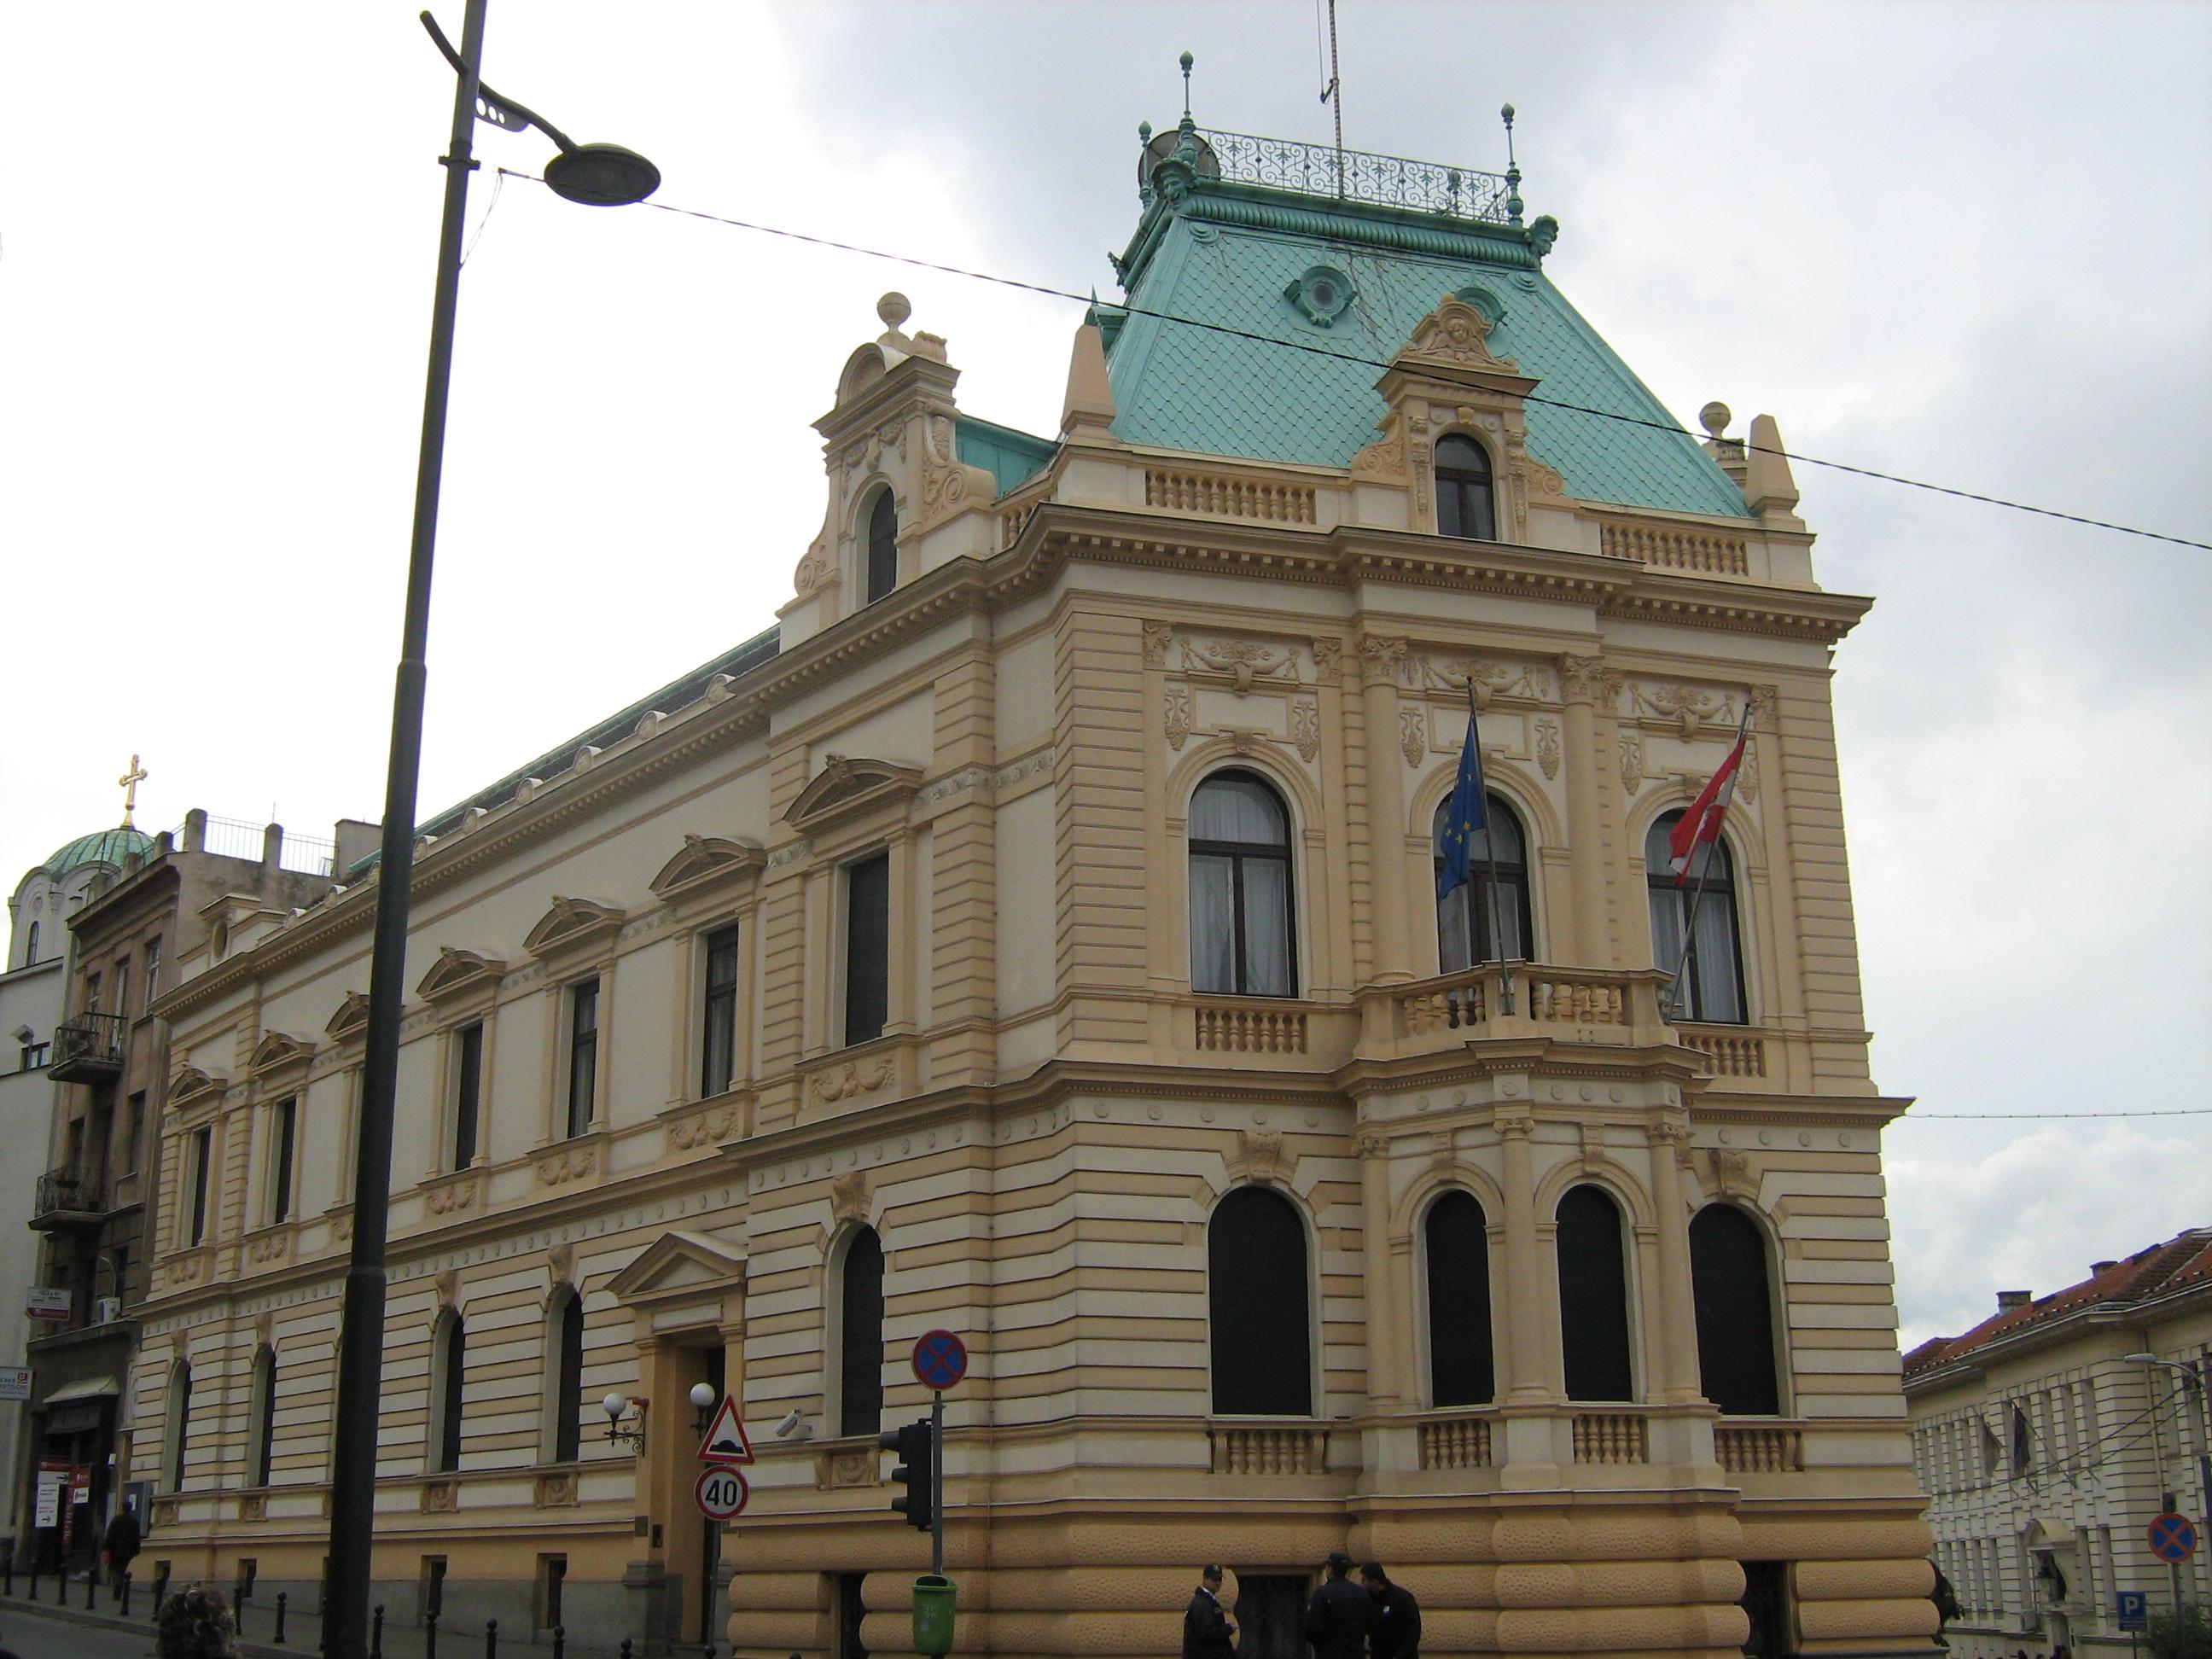 - Libanska Ambasada u Beogradu - lebanonembassy.rs